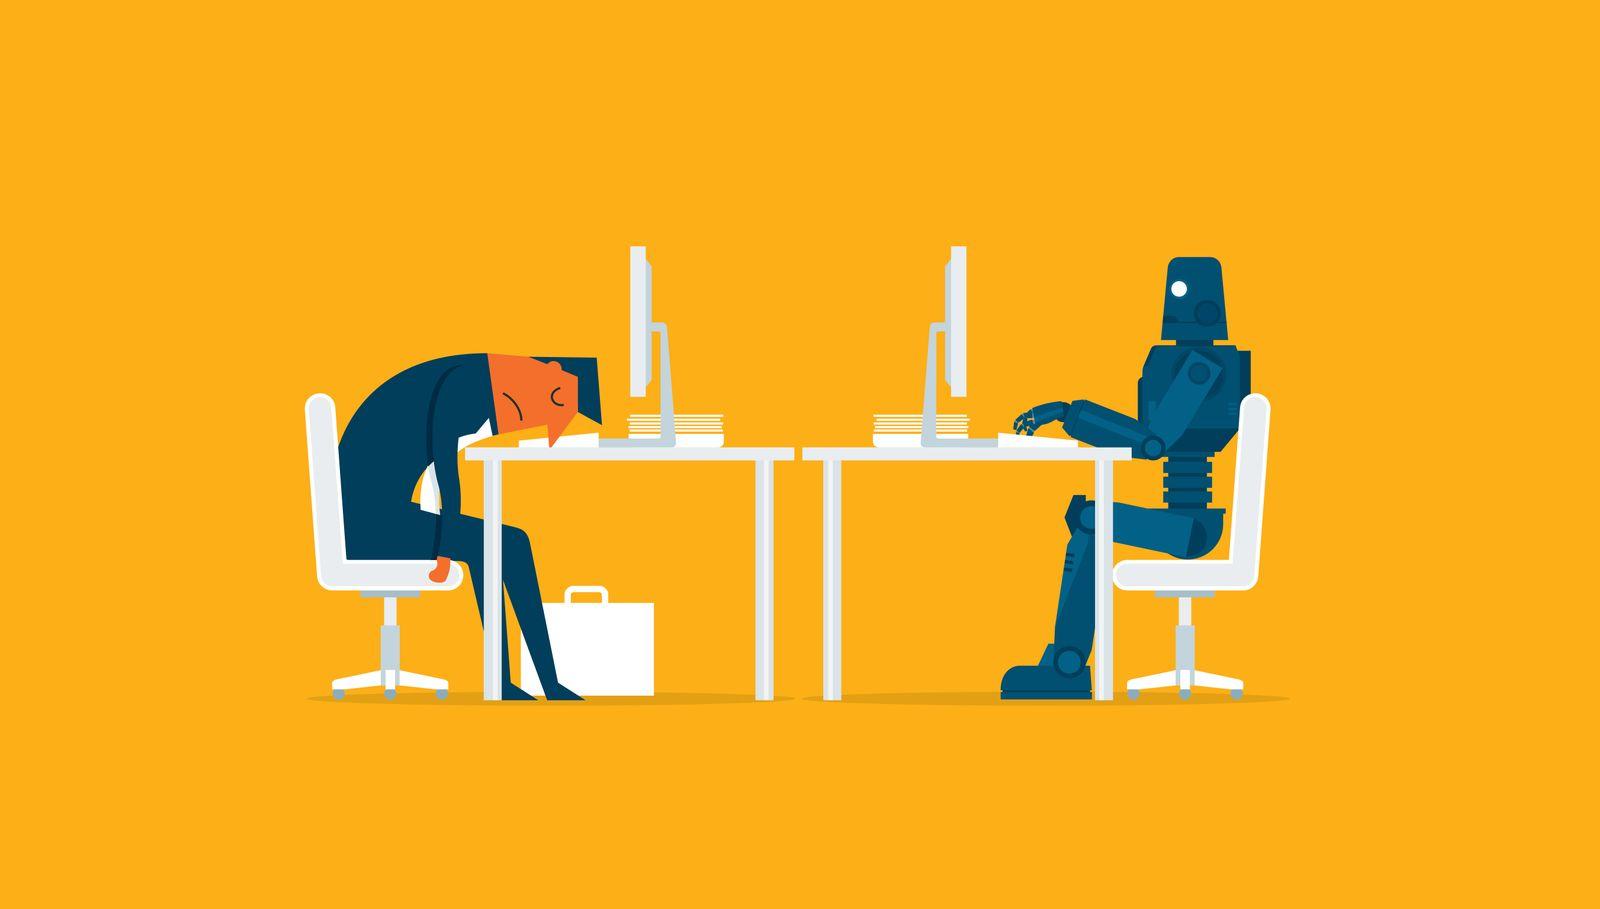 Robot vs man. Human humanoid robot work with laptops at desk